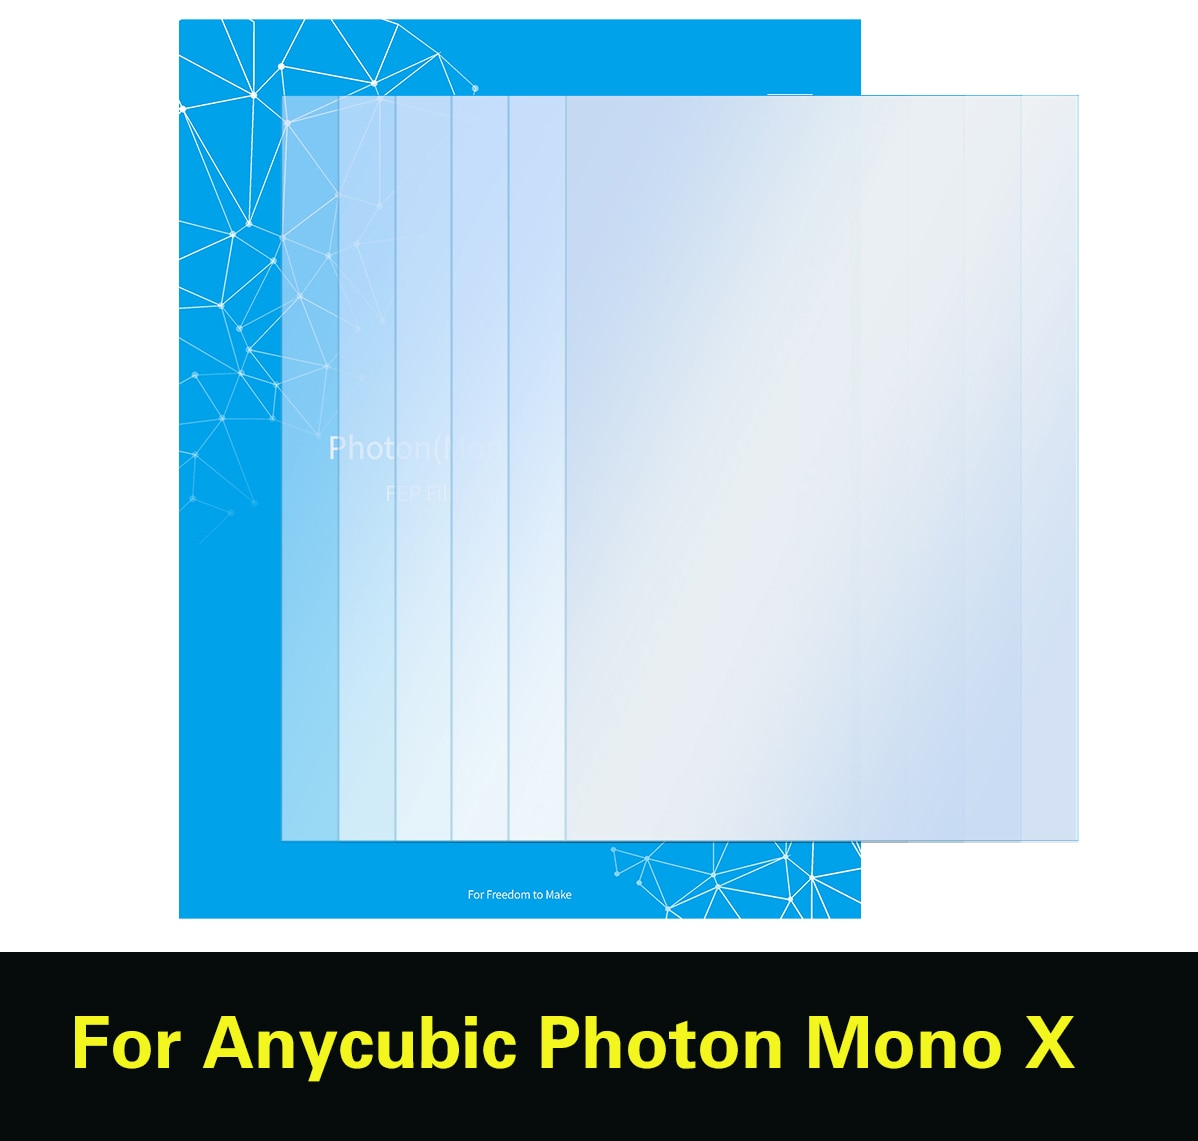 sla-3d-printer-part-fep-film-for-anycubic-photon-mono-x-015mm-260-165-uv-resin-lcd-3dprinter-5pcs-fep